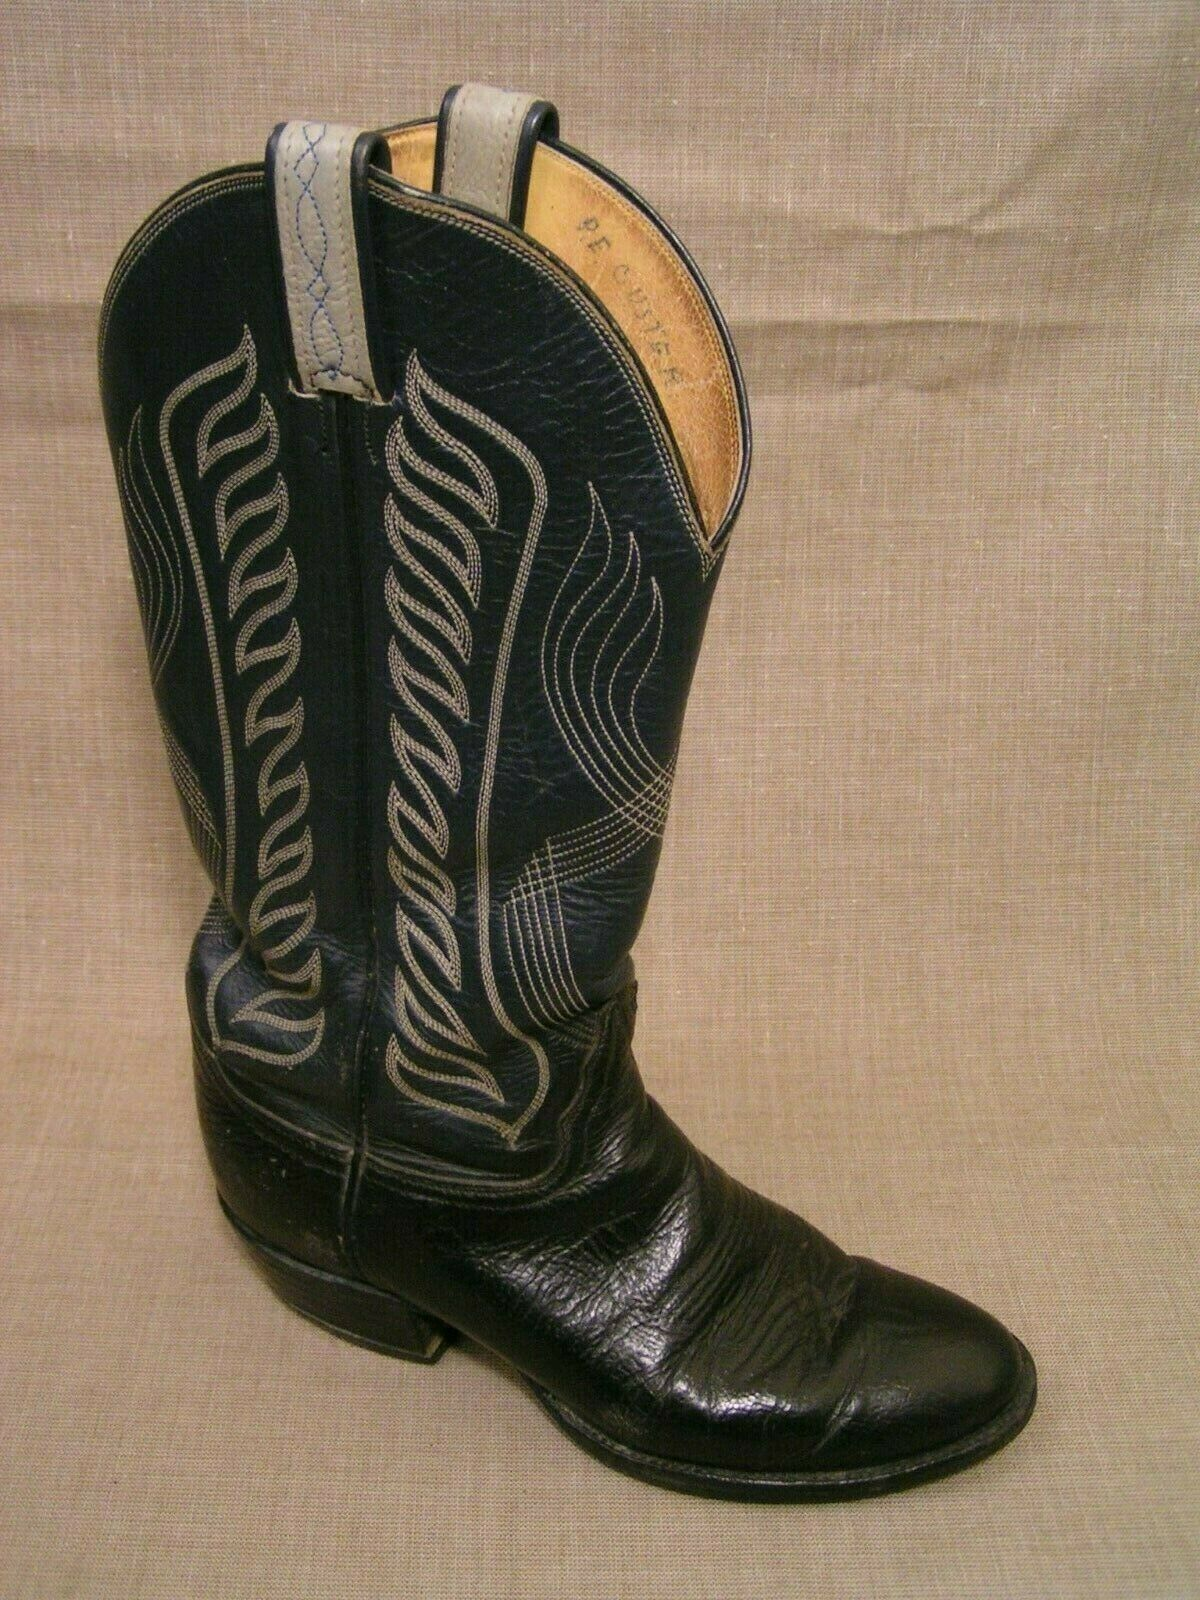 Tony Lama # 8119 Made in USA Black & Green and 50 similar items